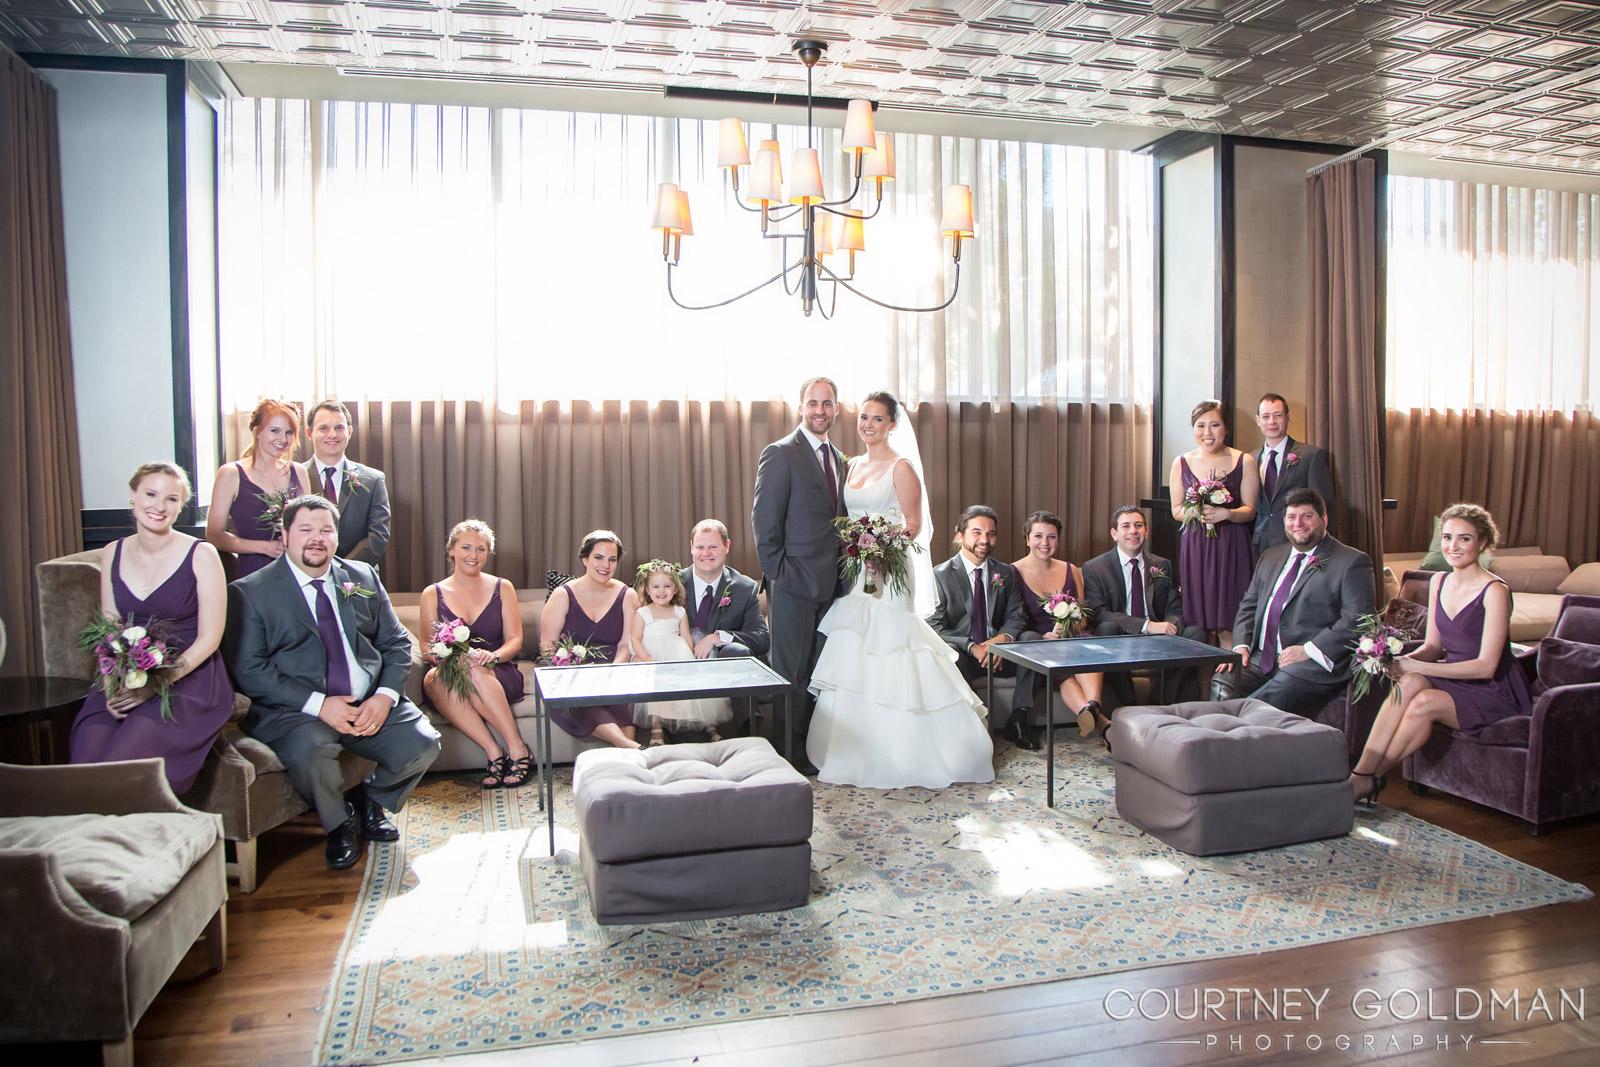 Atlanta-Wedding-Photography-by-Courtney-Goldman-06.jpg